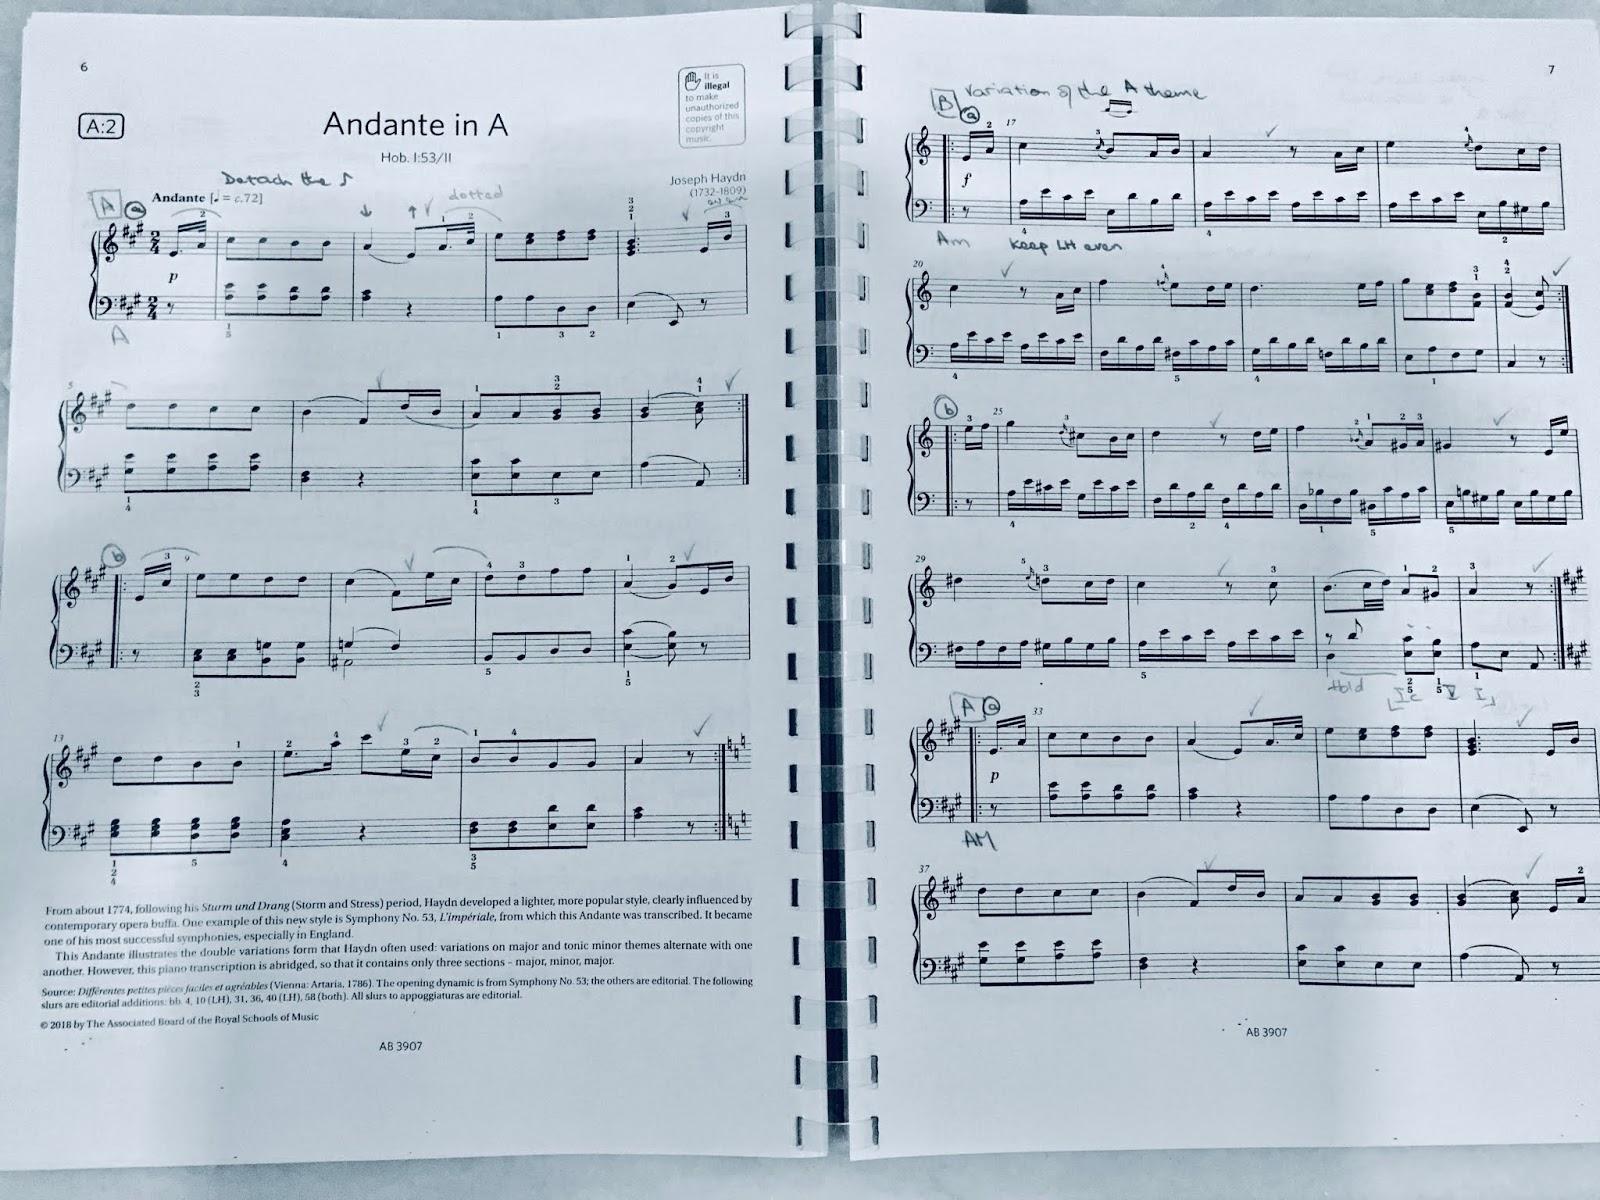 Jazz Clarinet Aural Tests & Quick Studies Grades 1-5 Sheet Music Book Abrsm Reliable Performance Musical Instruments & Gear